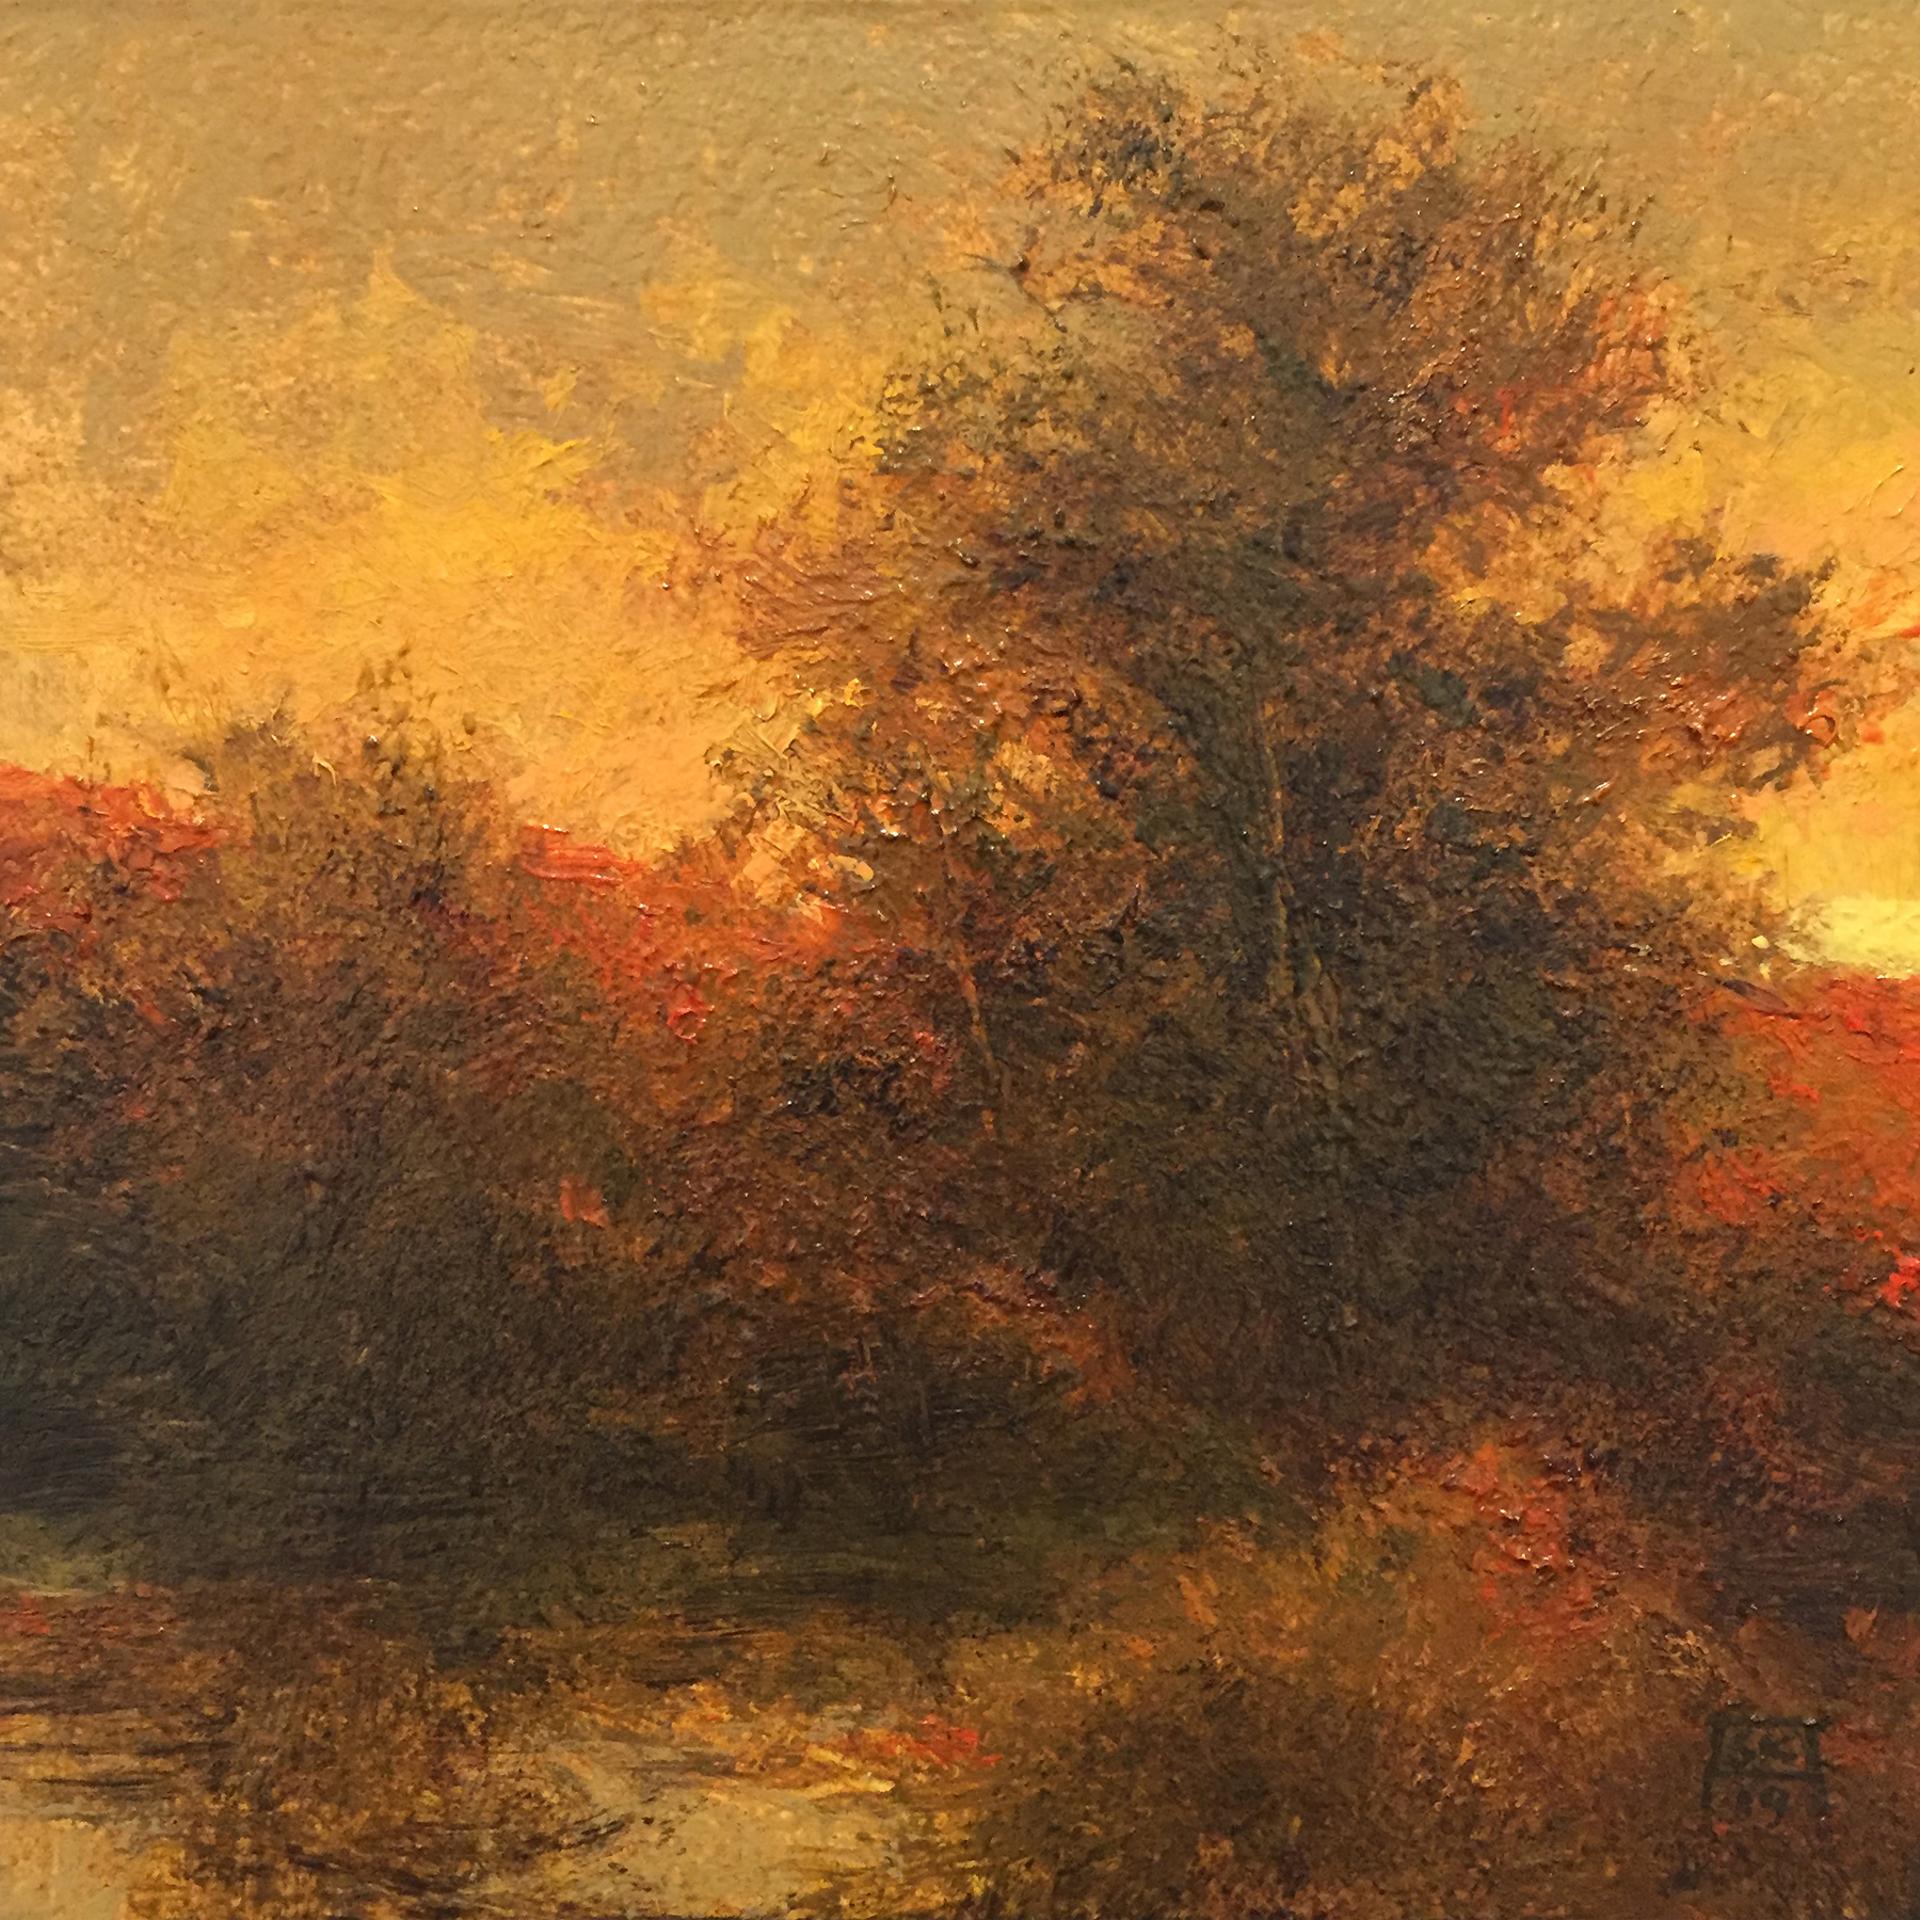 Evening (Ode to A. Hoeber) by Shawn Krueger